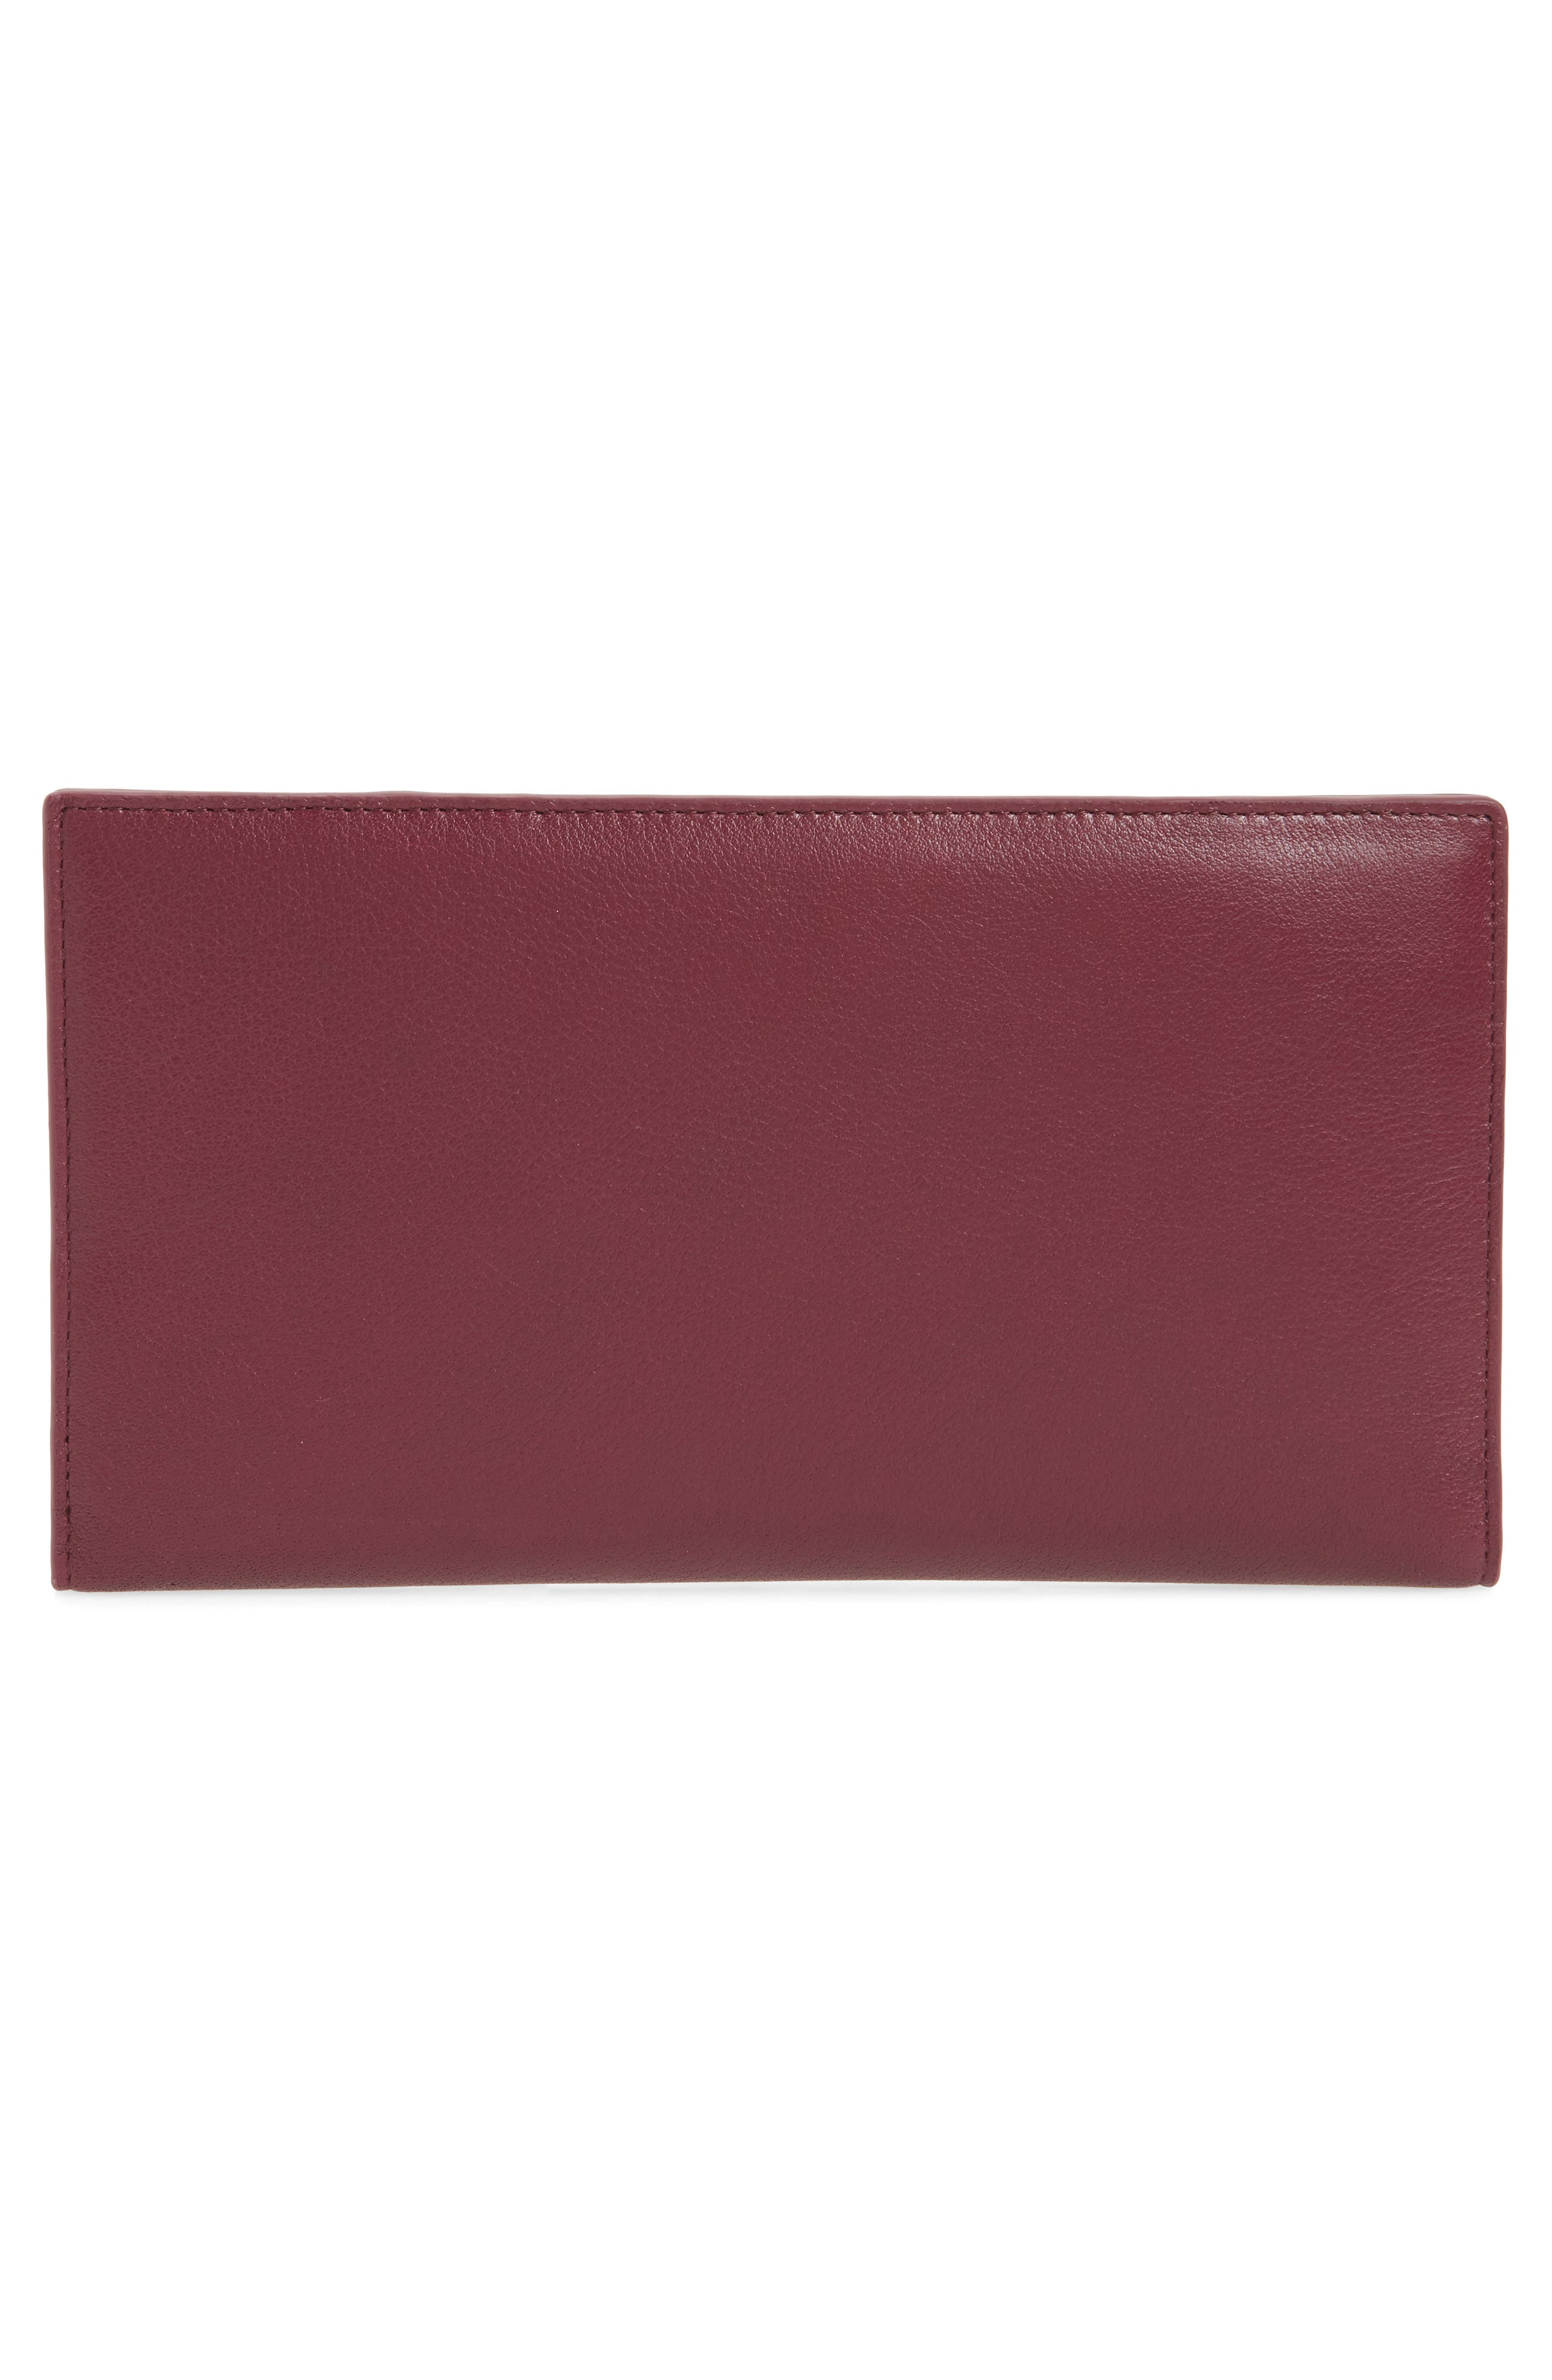 Alternate Image 2  - Ted Baker London Dolle Leather Travel Wallet